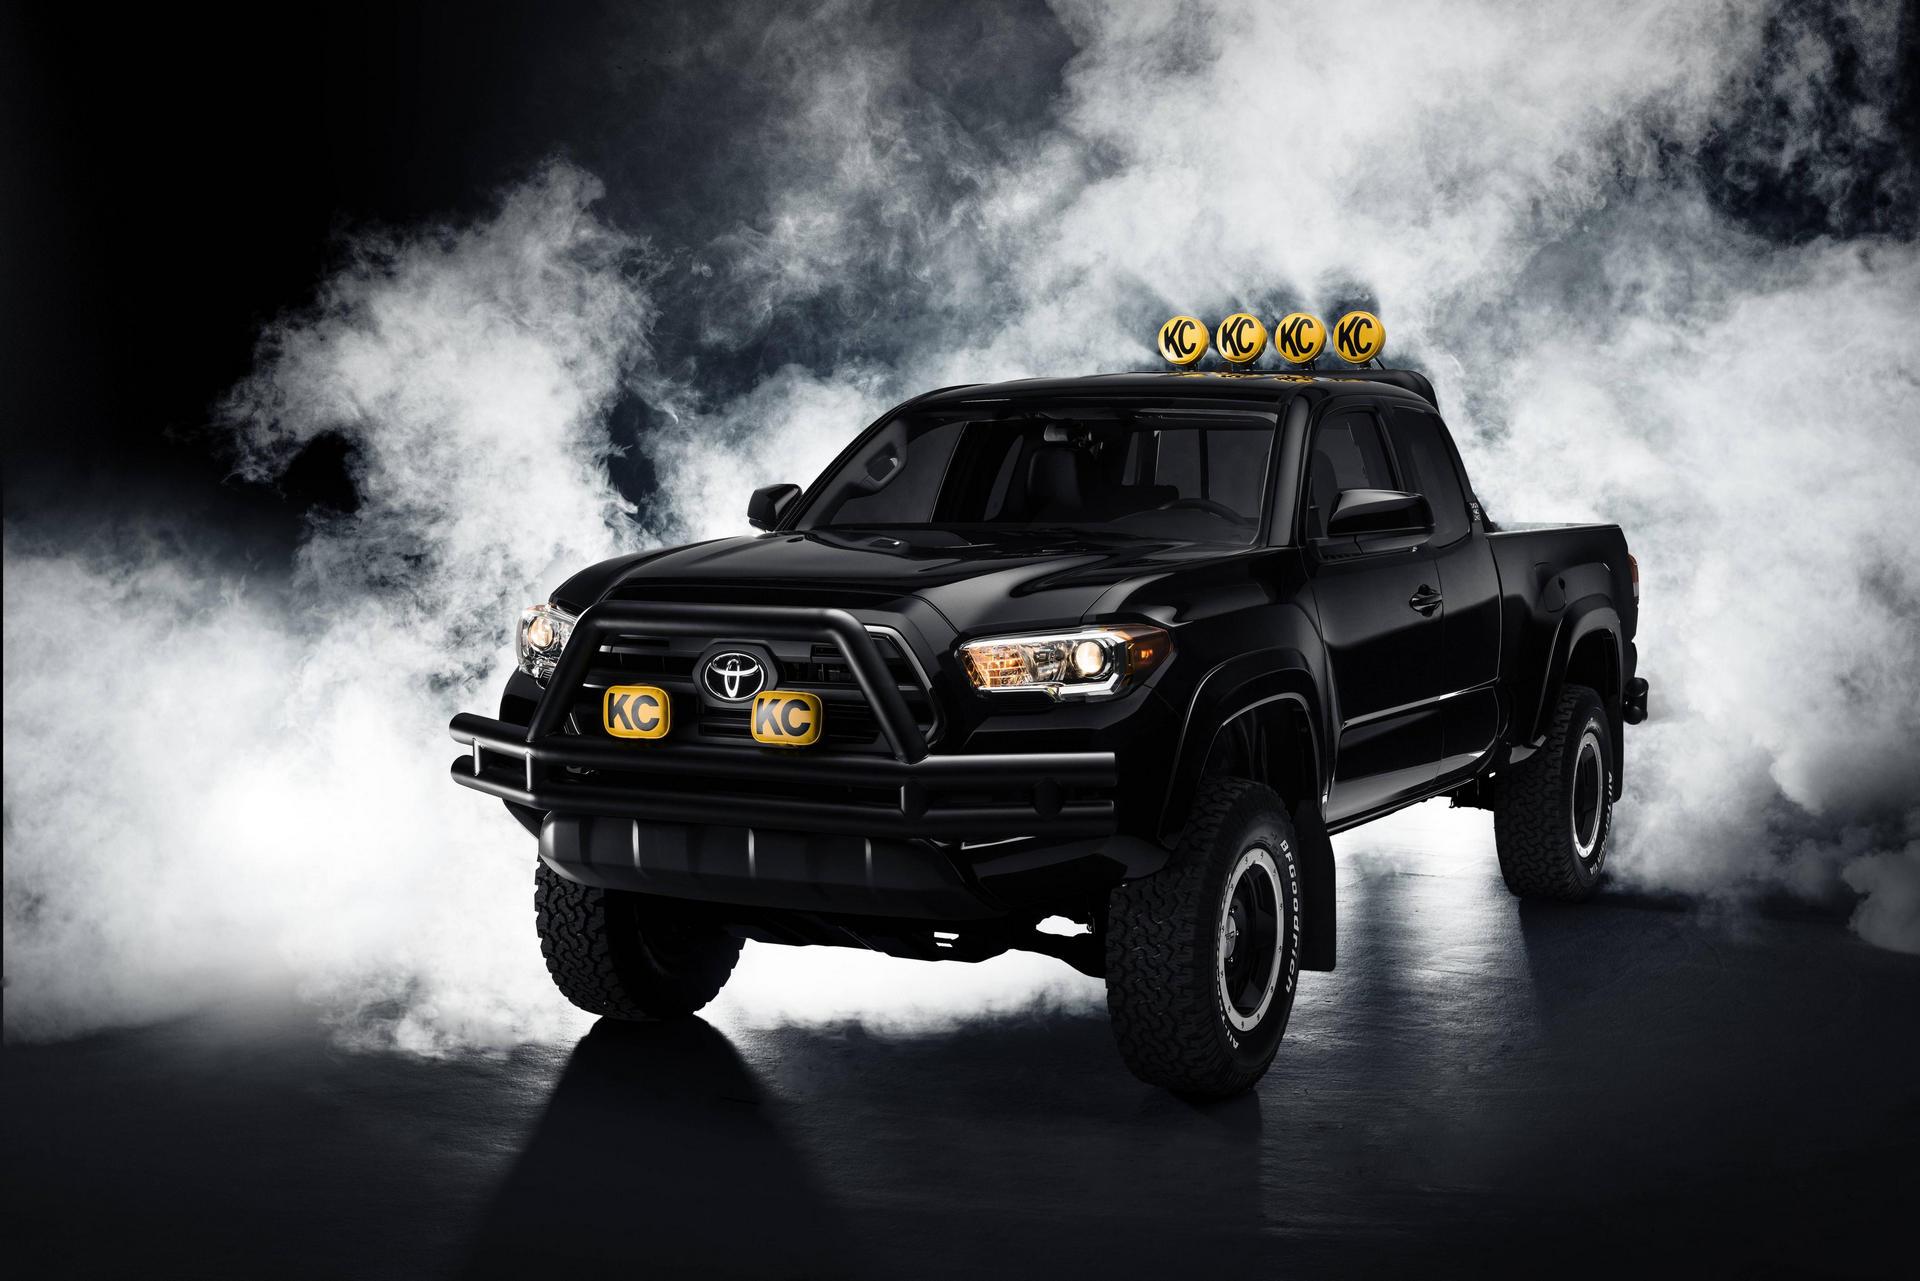 Toyota Tacoma © Toyota Motor Corporation